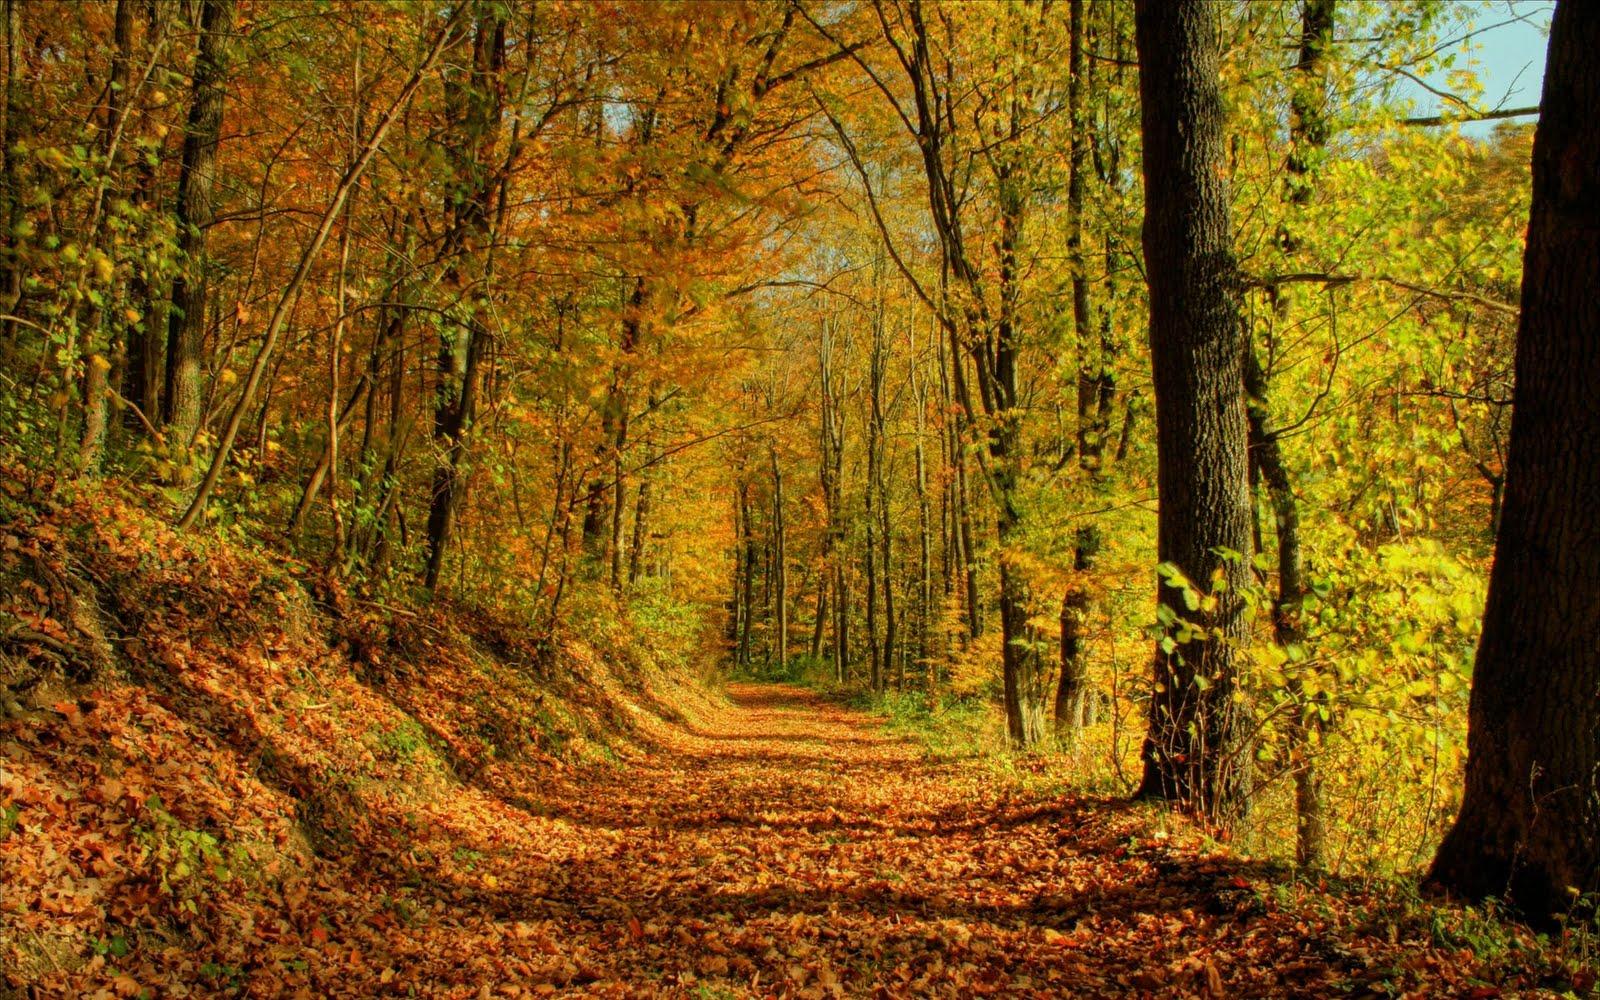 http://1.bp.blogspot.com/-rf5QpO8U6i8/Til15MwRFUI/AAAAAAAAAB4/IdZ6sV0-T6g/s1600/autumn+forest+landscape+wallpaper.jpg